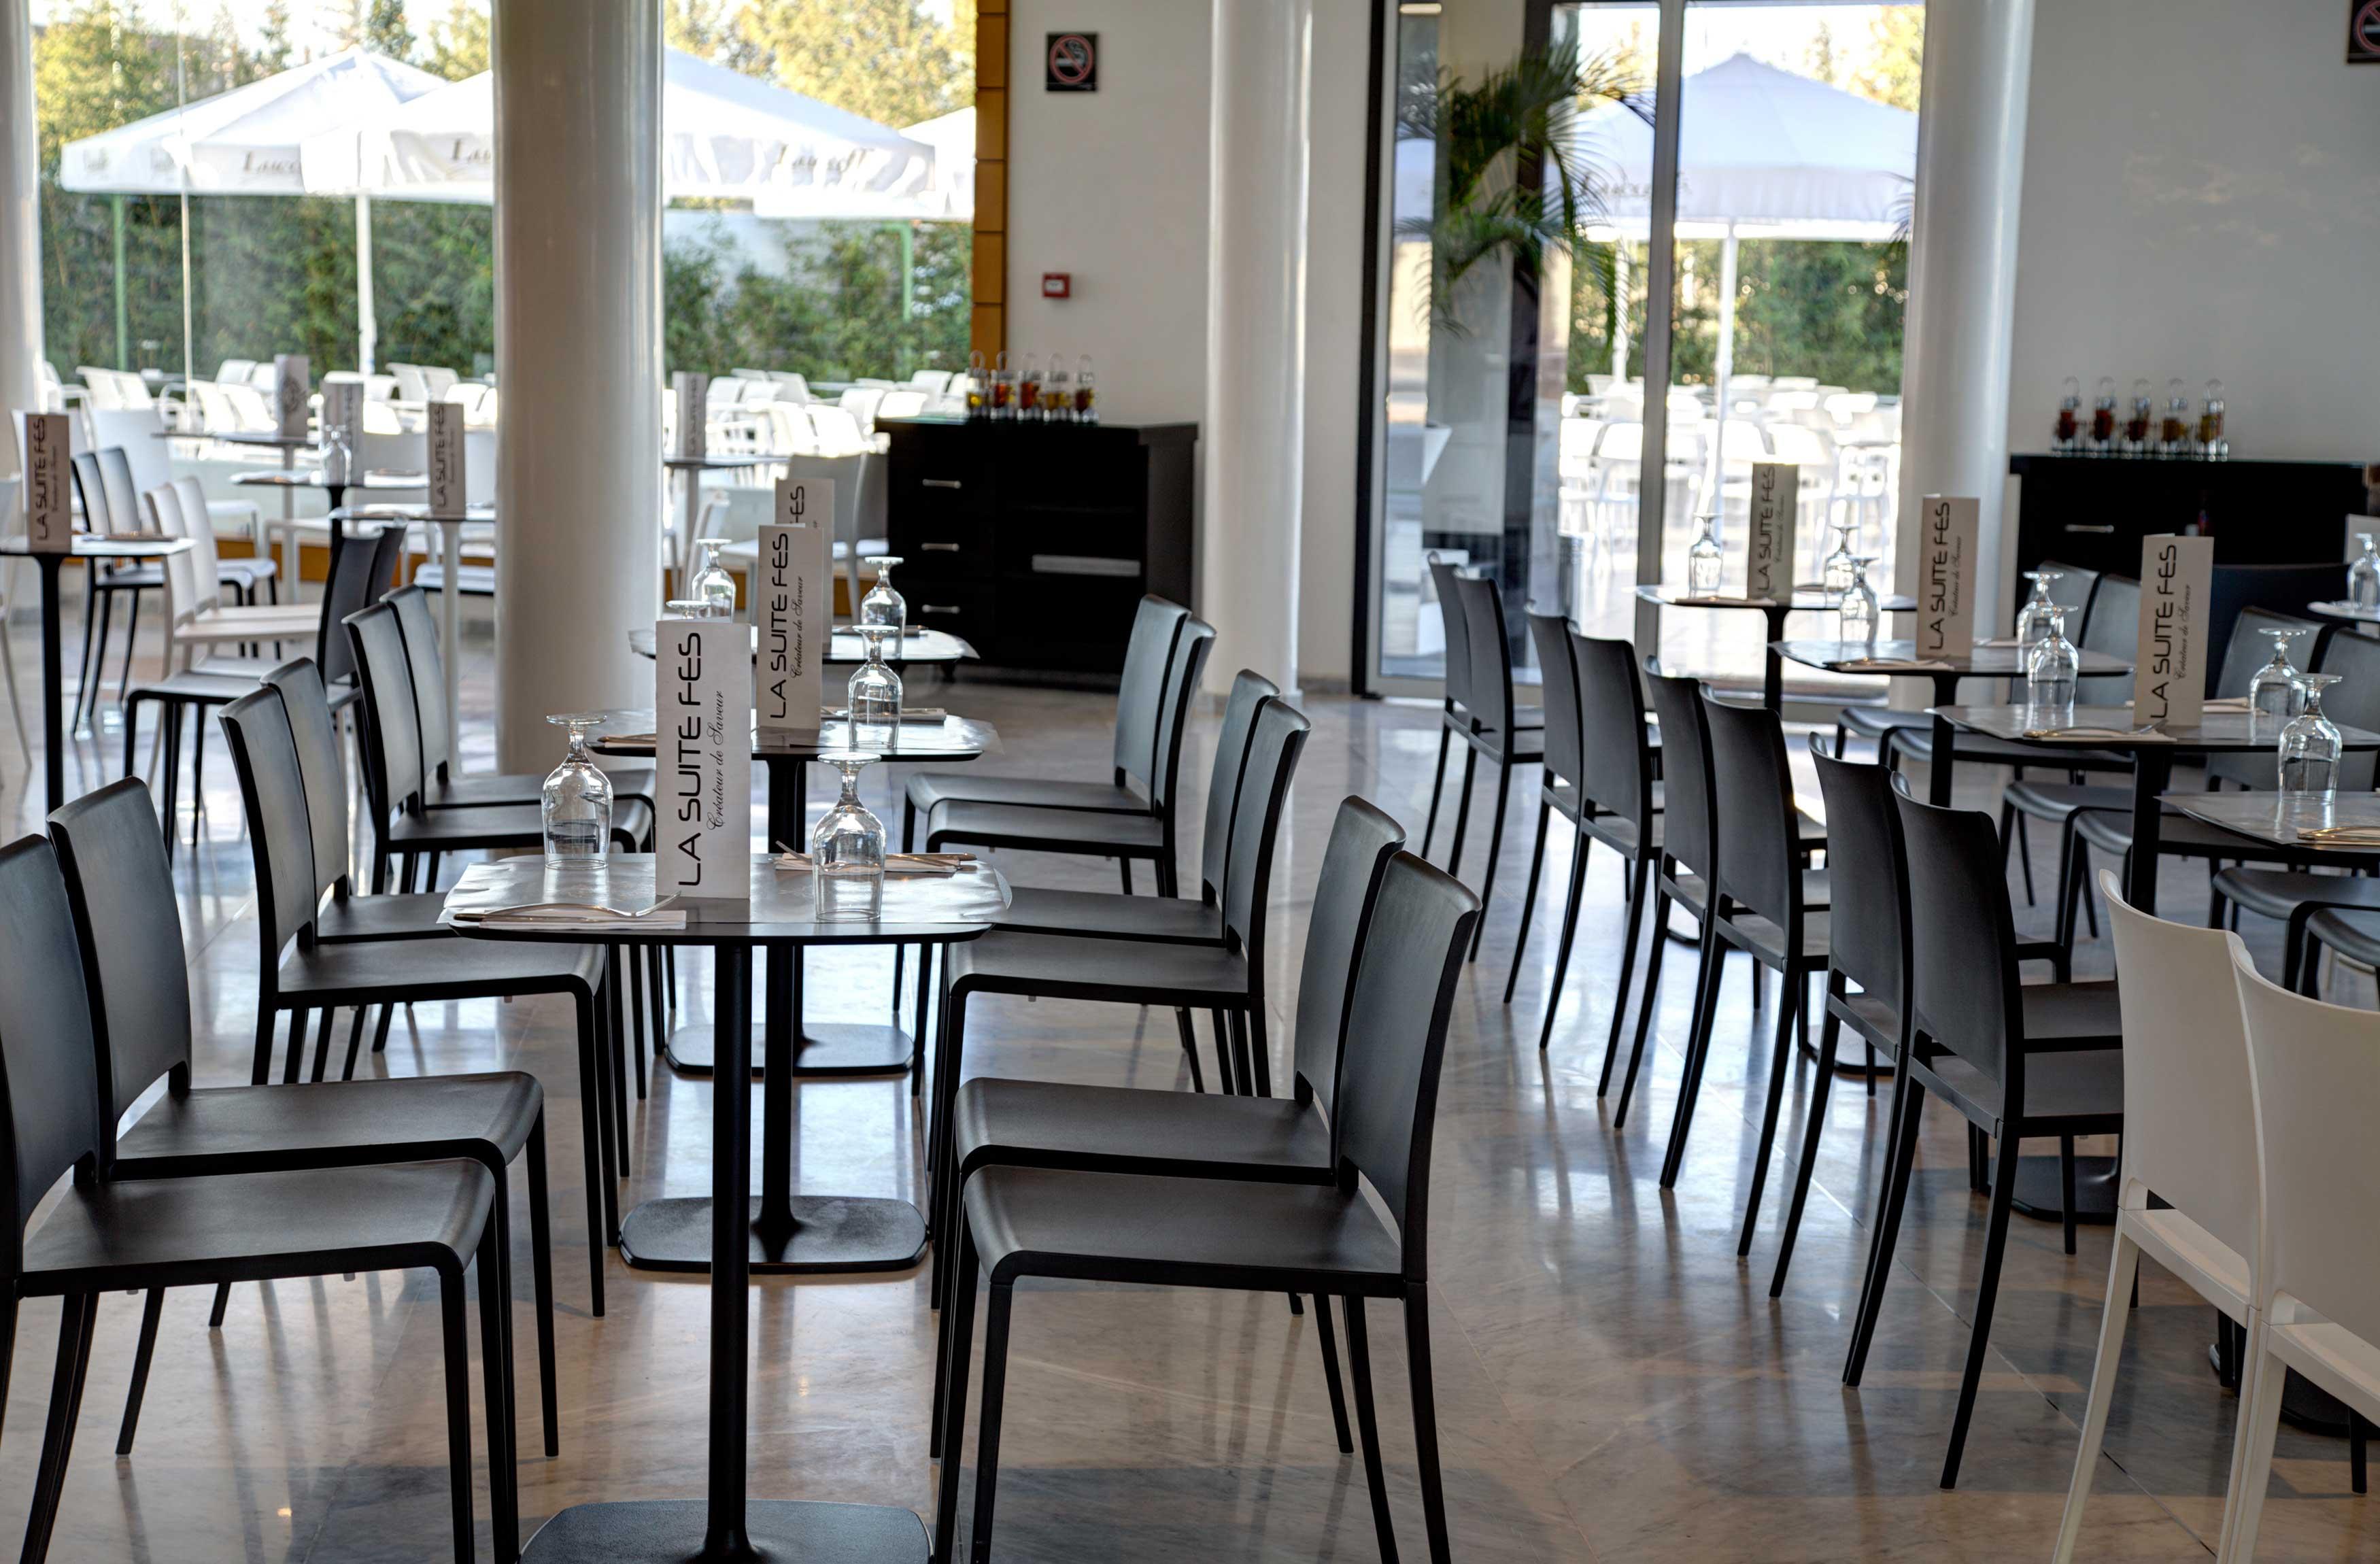 cafe restaurant a fes